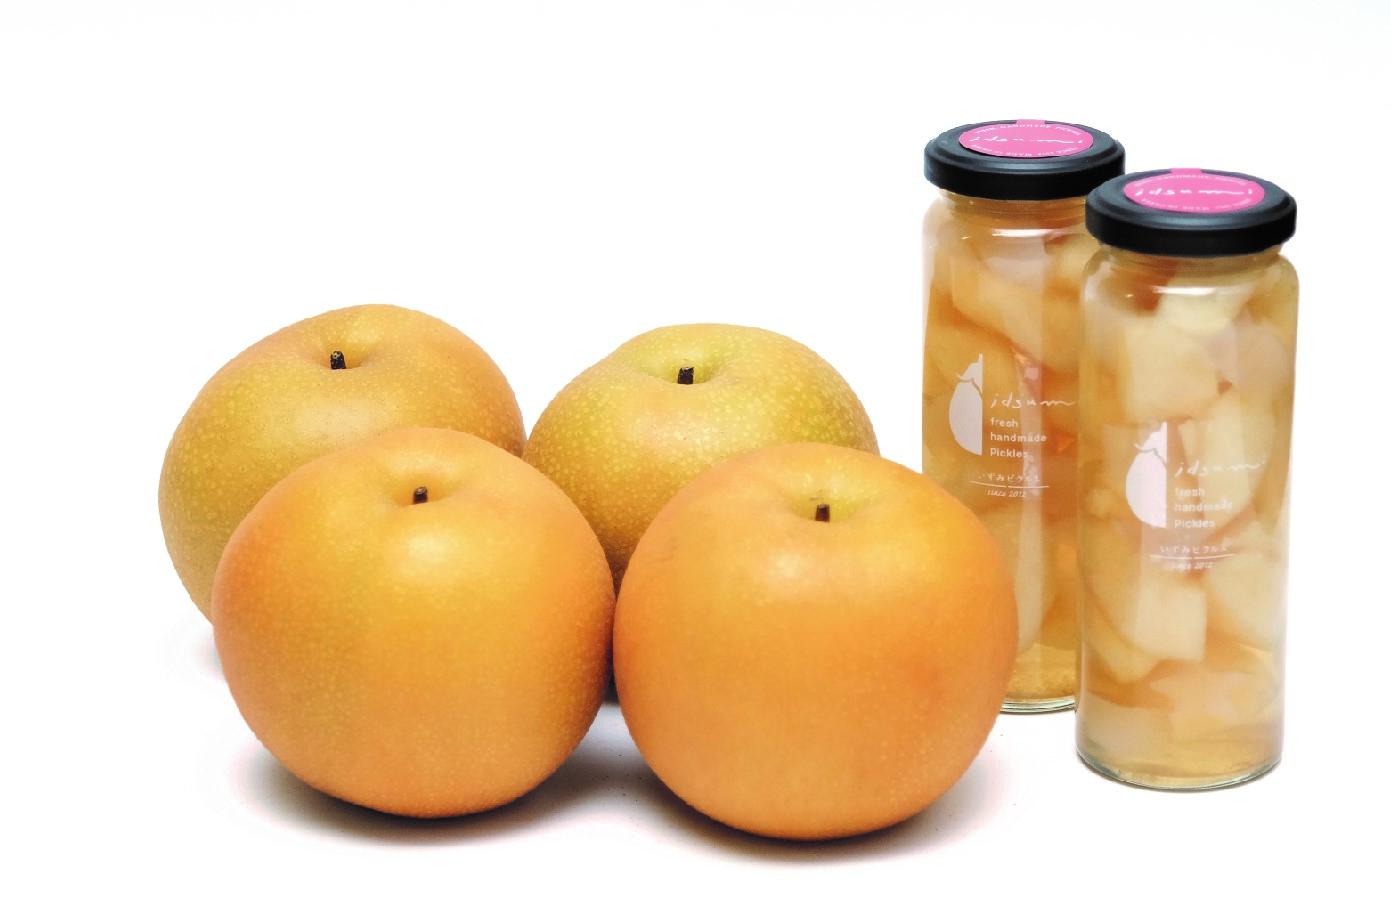 099H509 【期間限定】梨と梨のコンポートセット(梨4個、梨のコンポート2個)